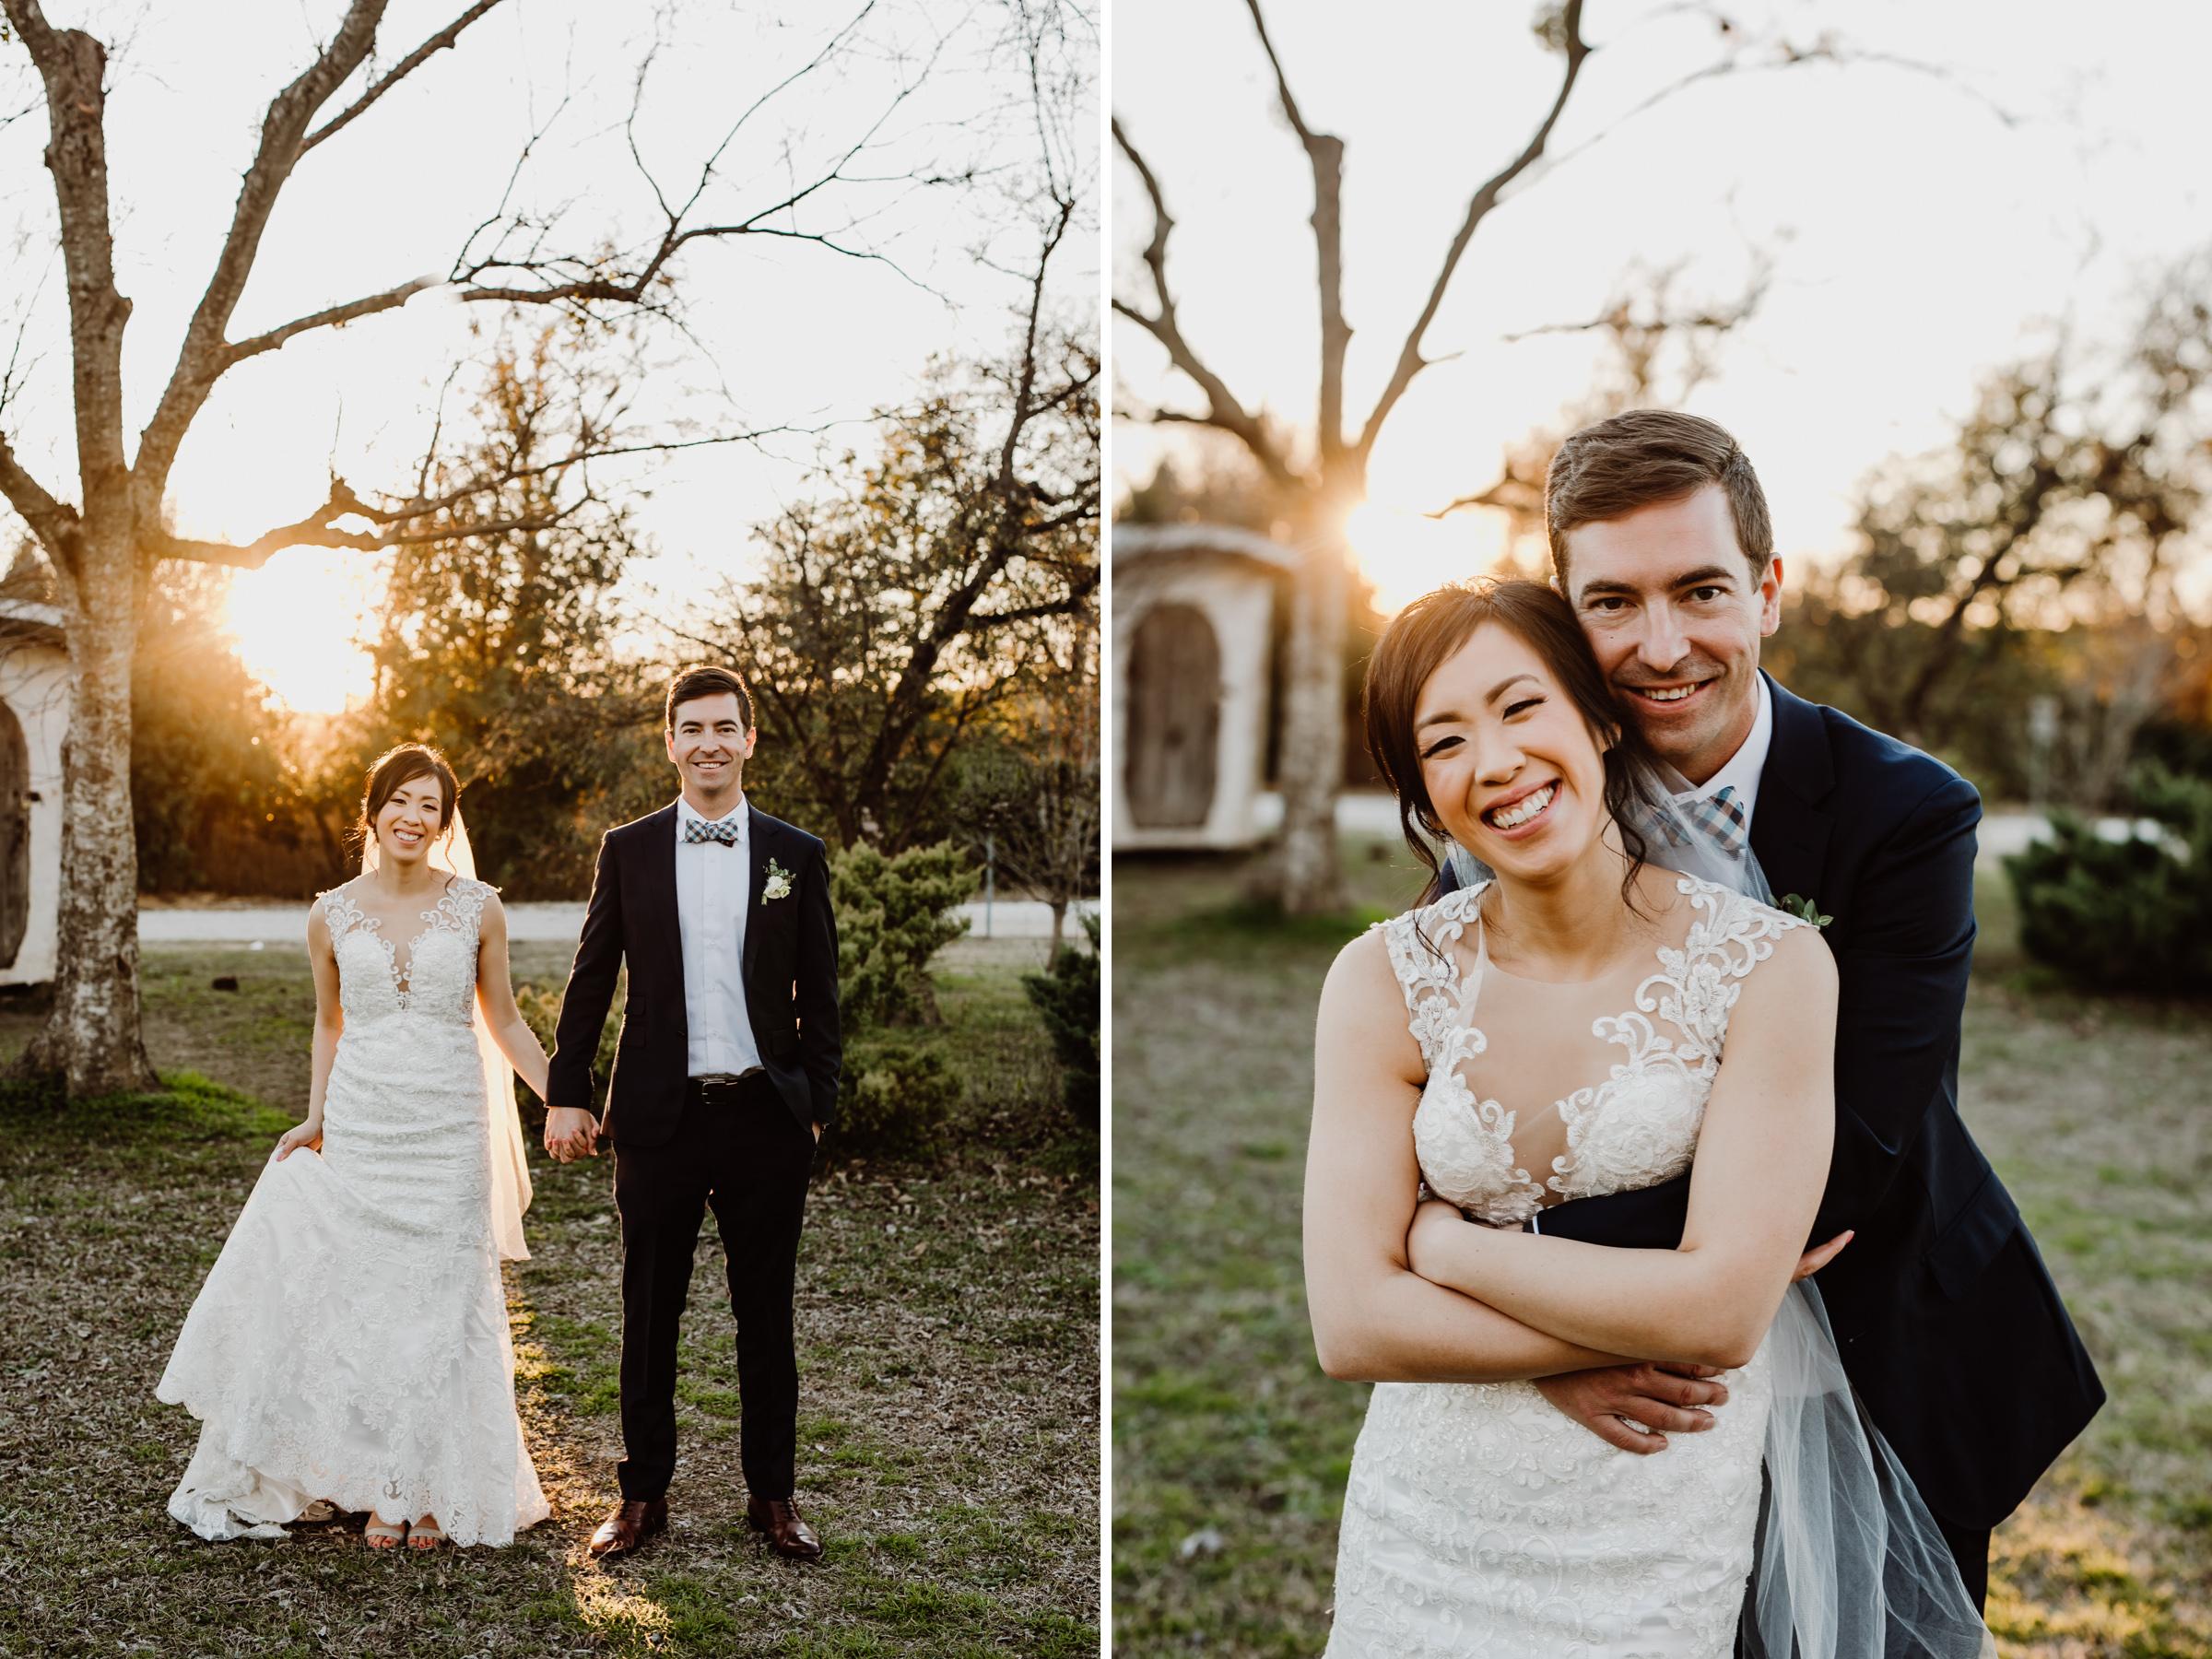 barr-mansion-wedding-10.1.jpg